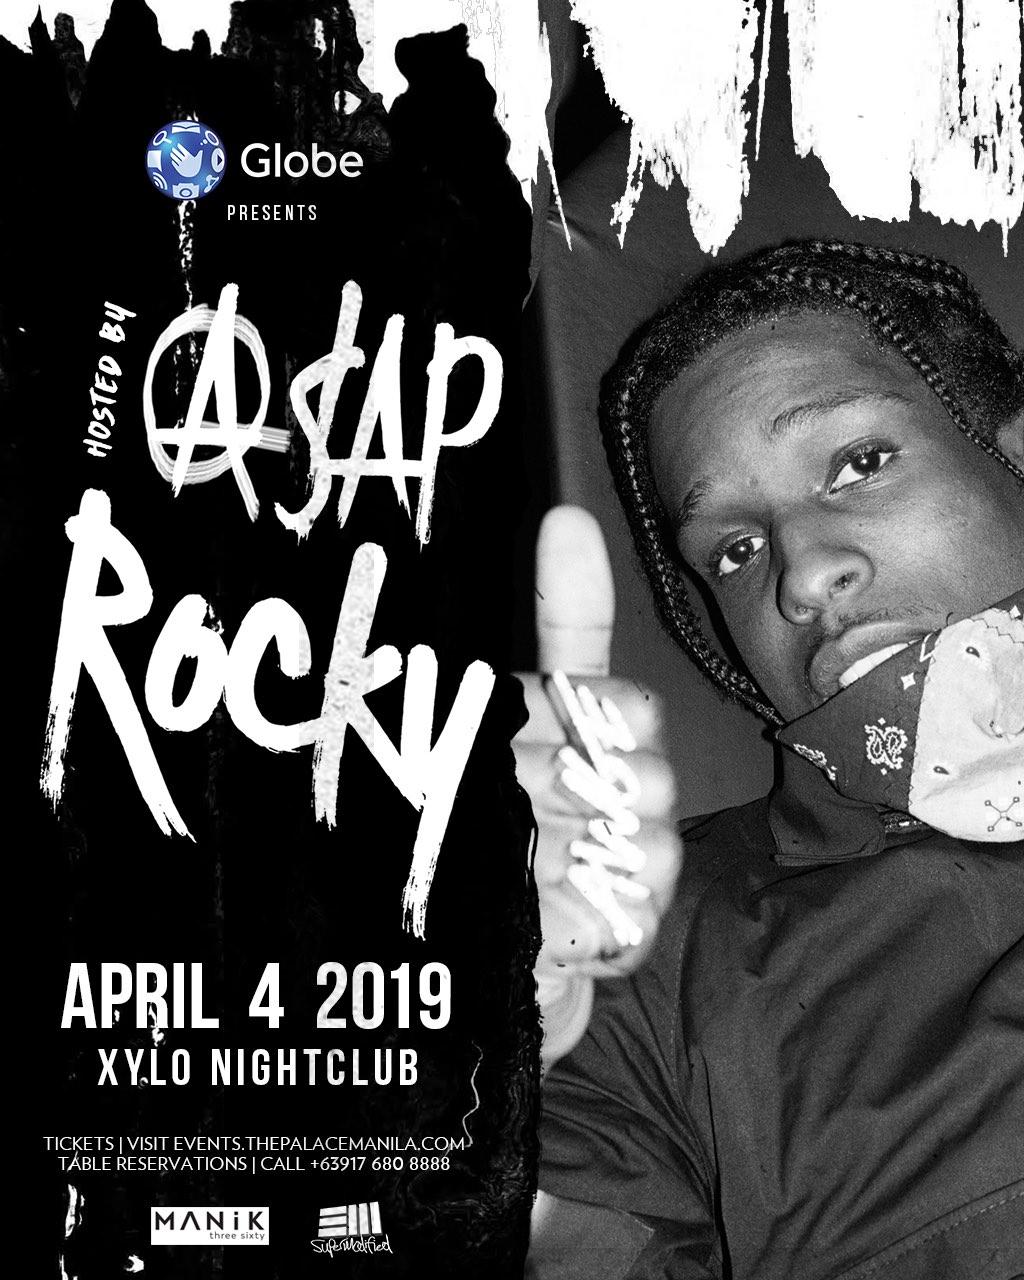 A$AP ROCKY at XYLO Nightclub